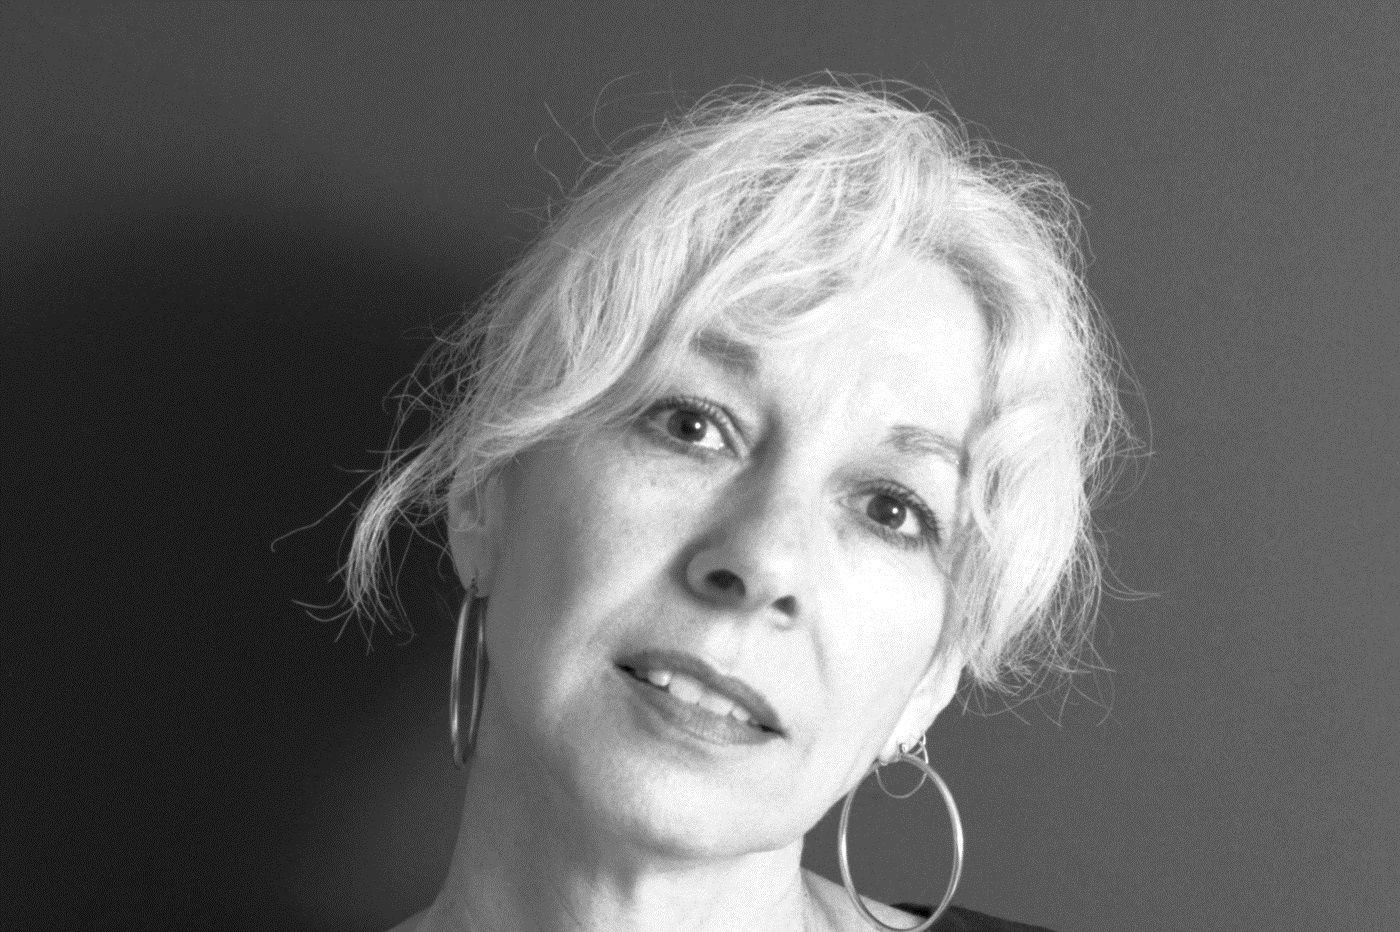 Susan Fenton, 69, St. Joseph's University faculty member and artist